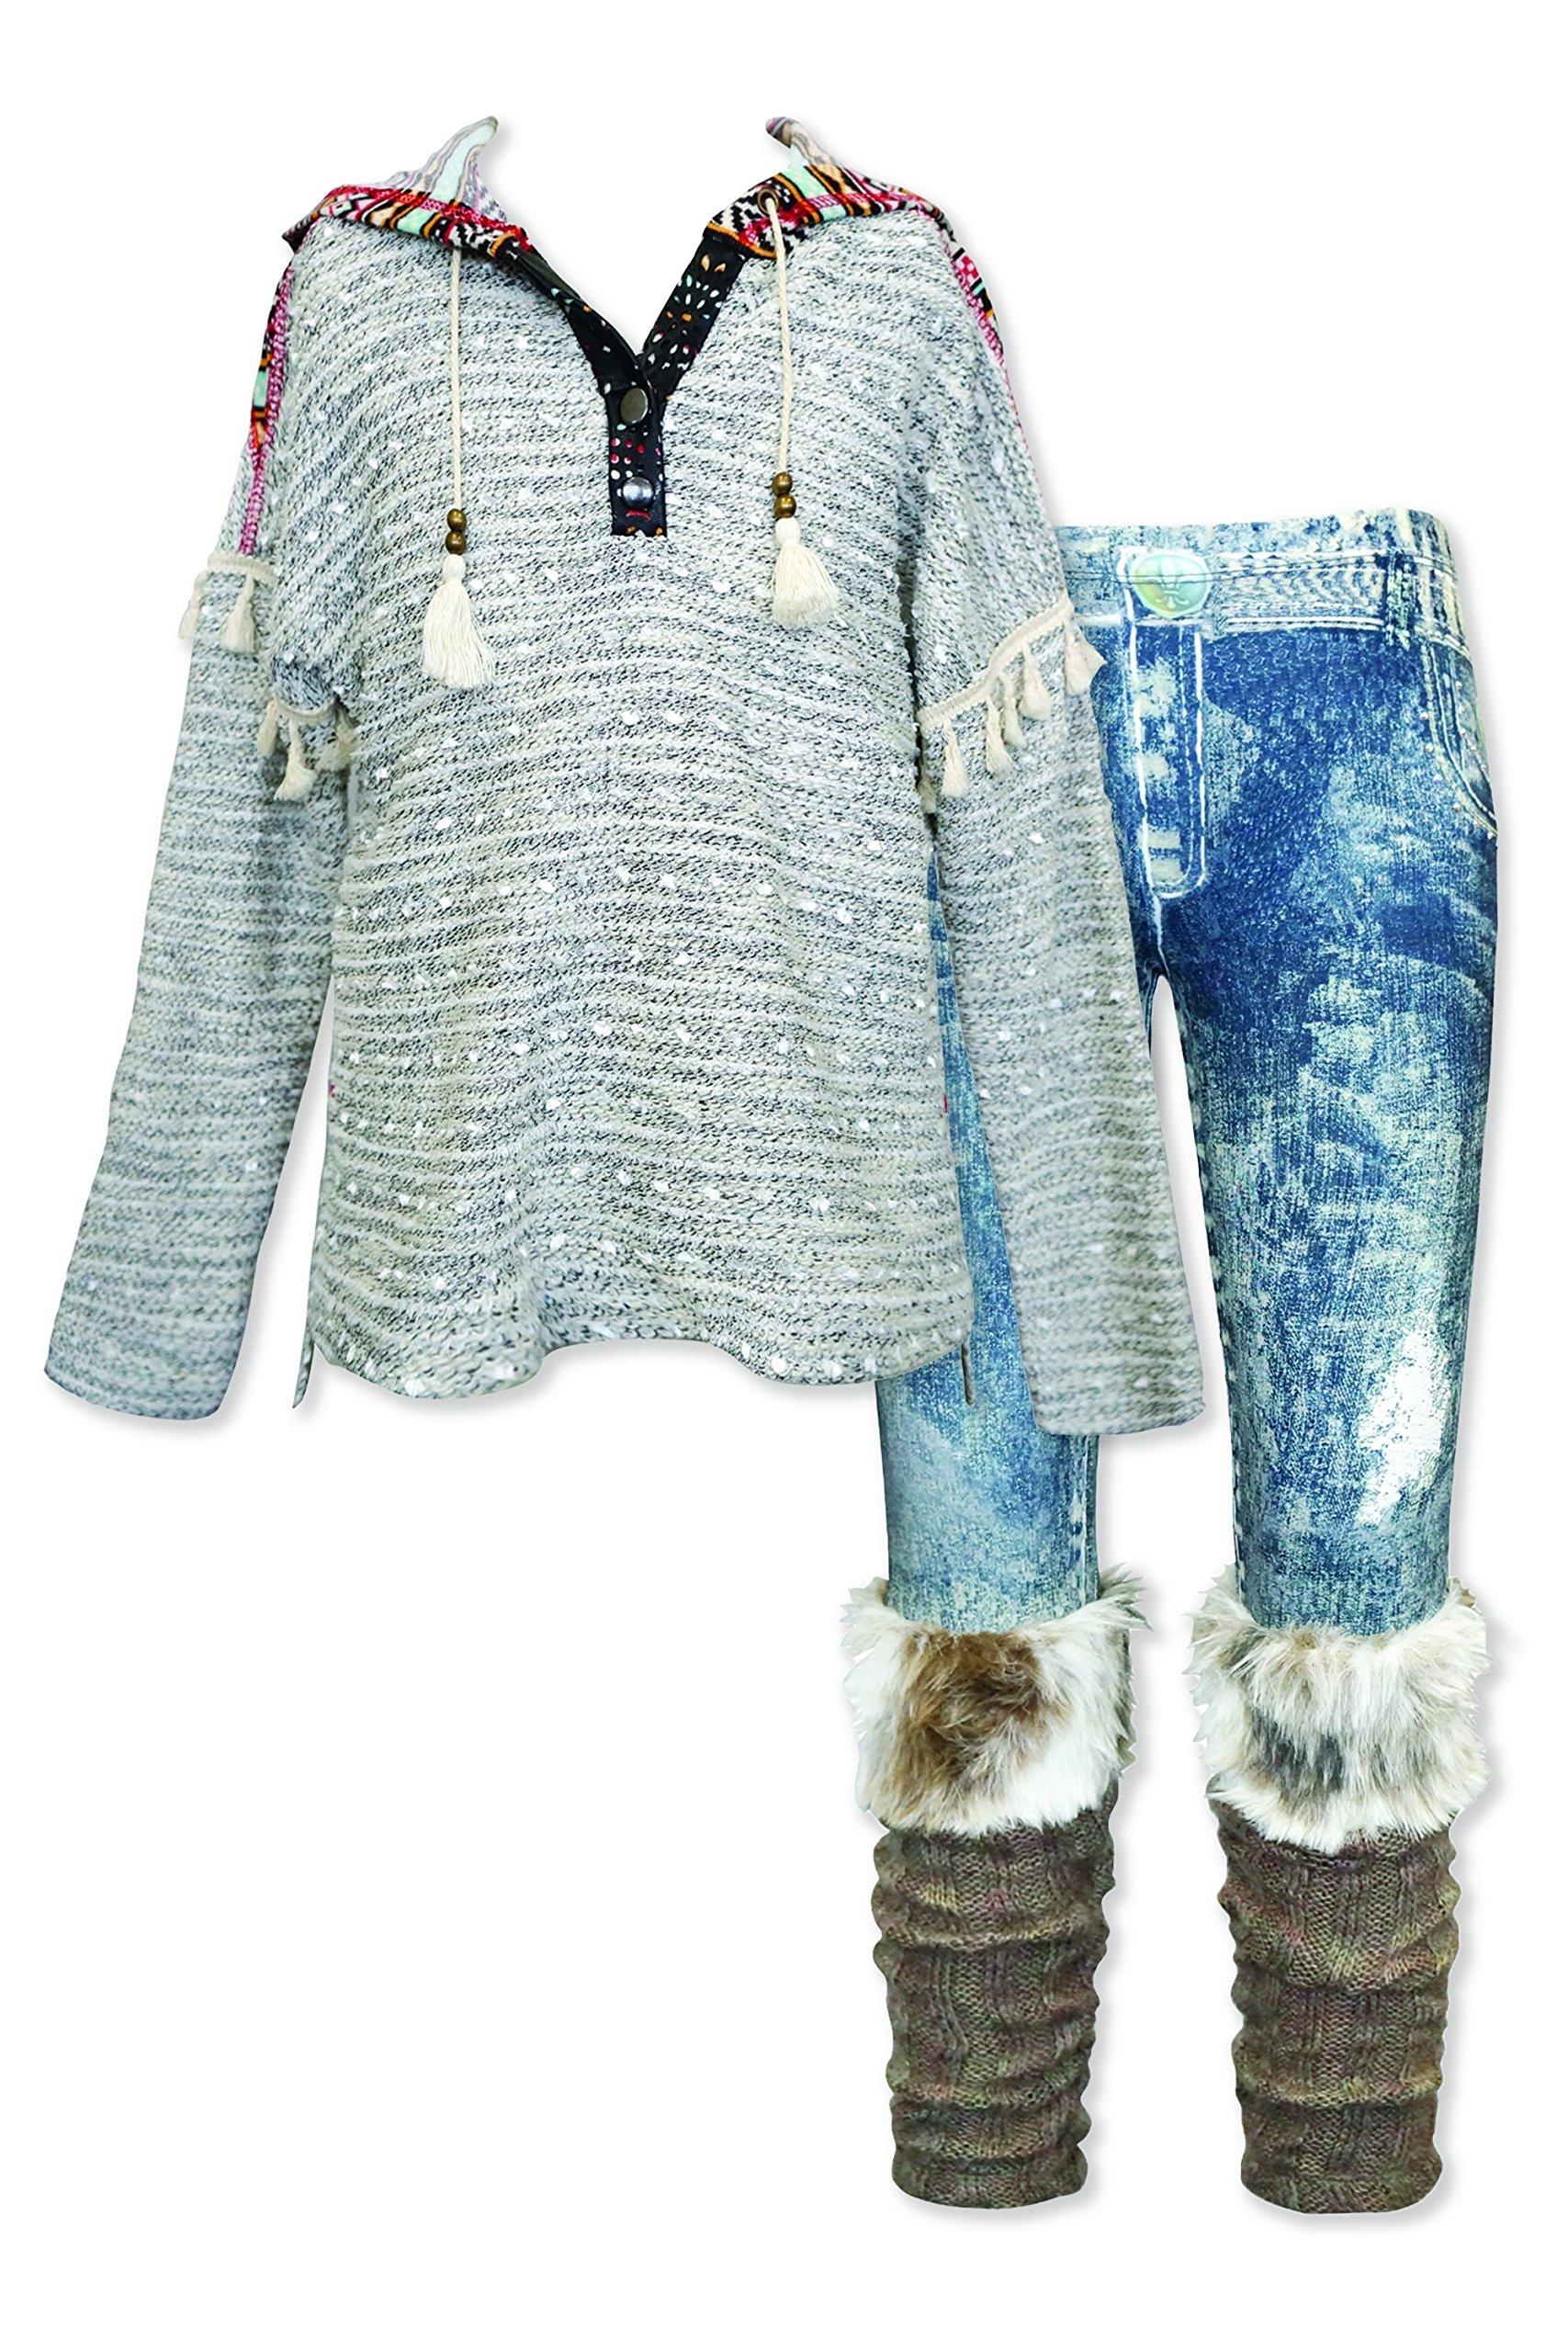 SaraSara Girls' Long Sleeve Embellished Top & Bottom Set, 2-6X, 7-14 (7, Heather Grey Multi)